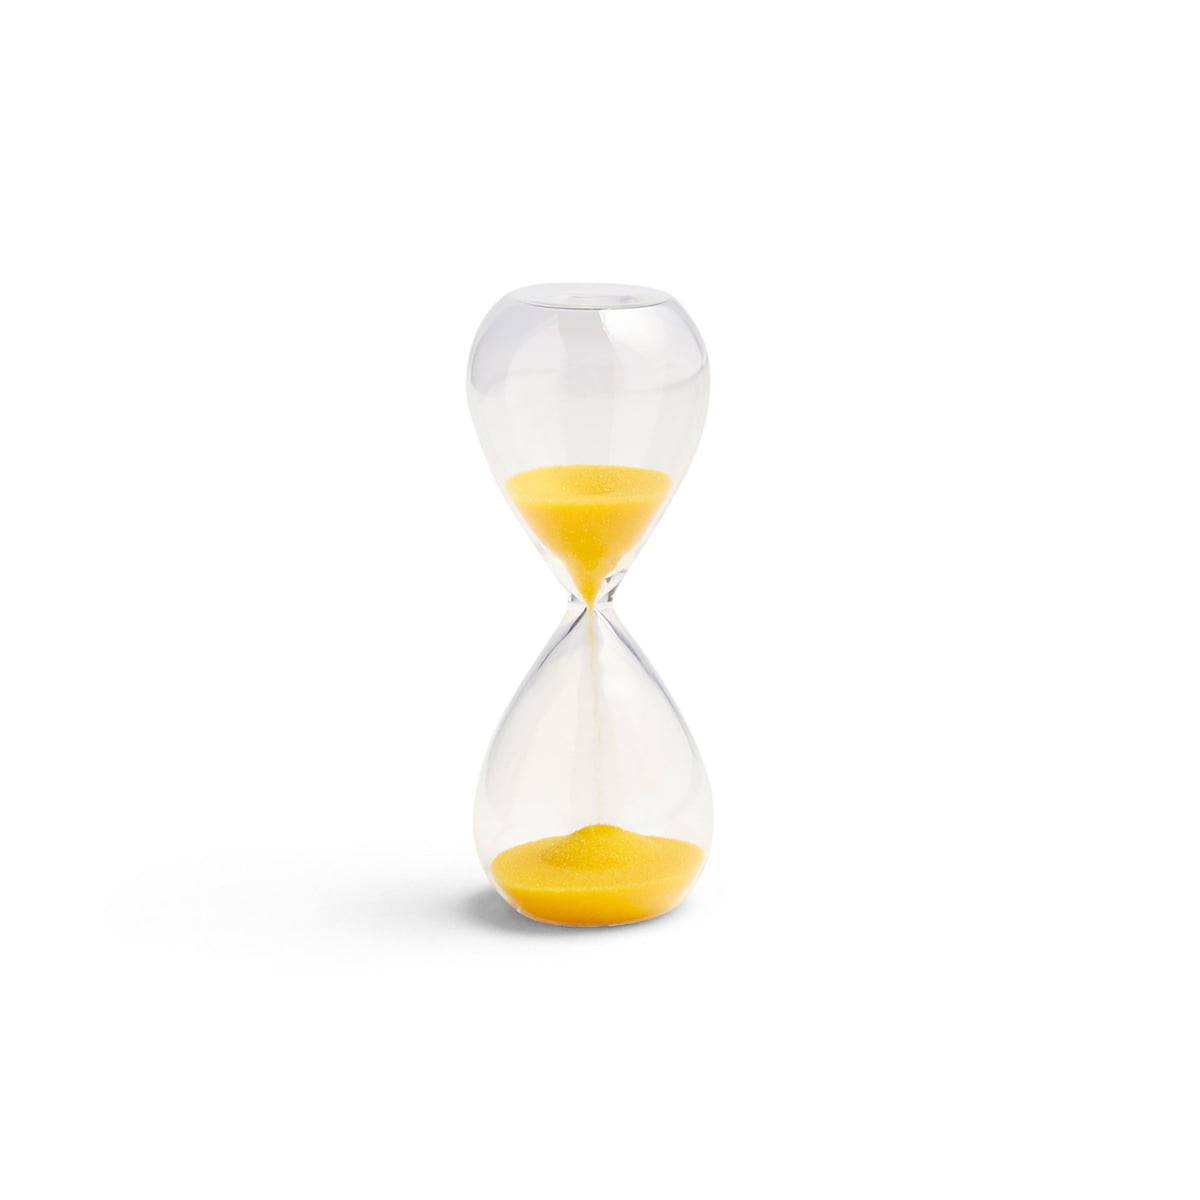 HAY - Time Sanduhr S, lemon yellow (2019)